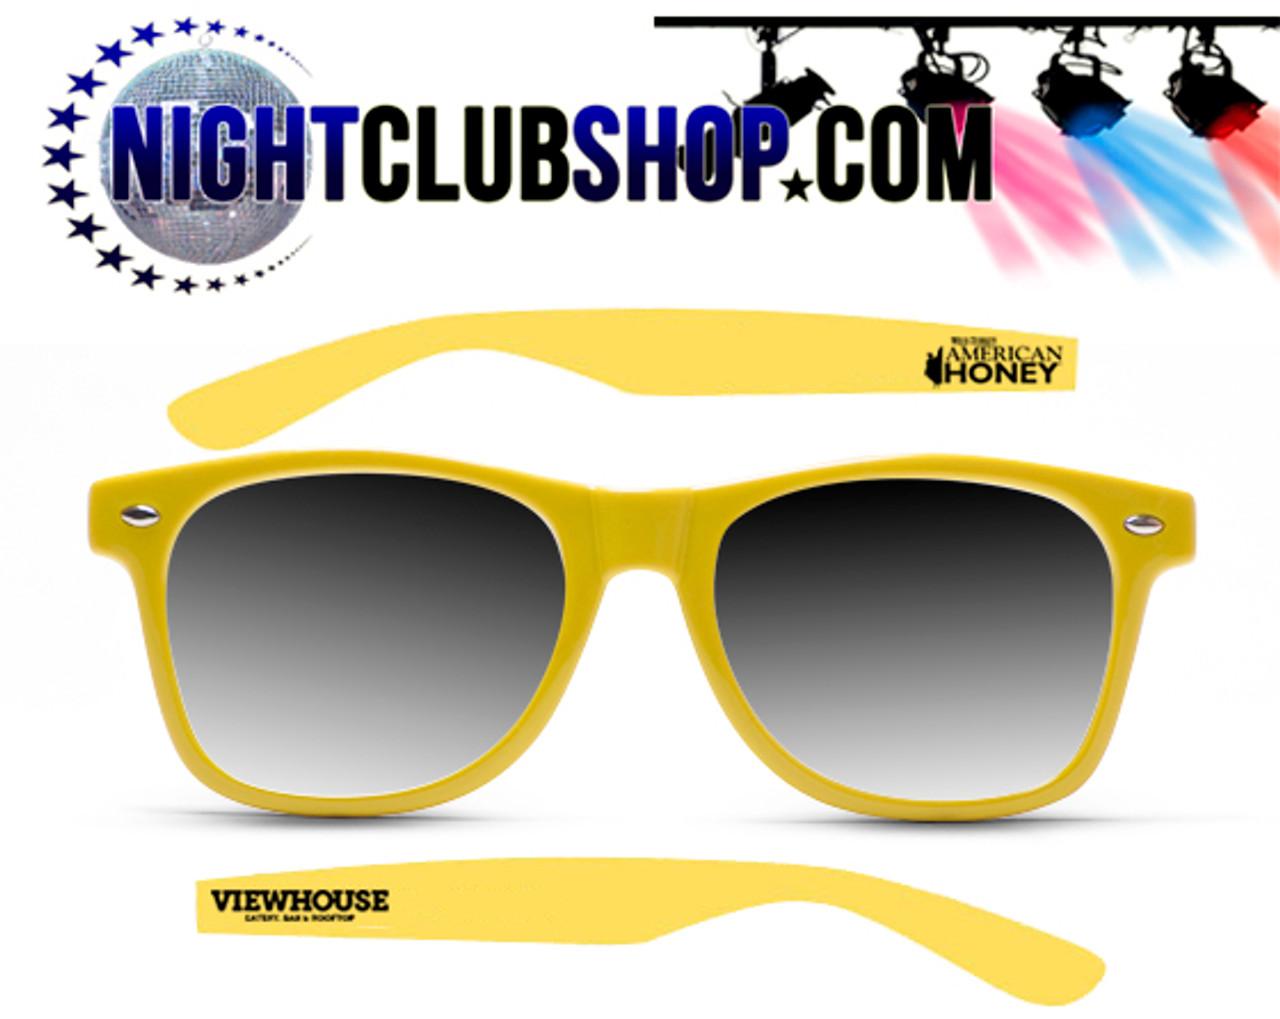 o ooo chupacabsun glasses.Neon, GLOW, Yellow,Custom printed,design, logo, art, bulk, whoesale,